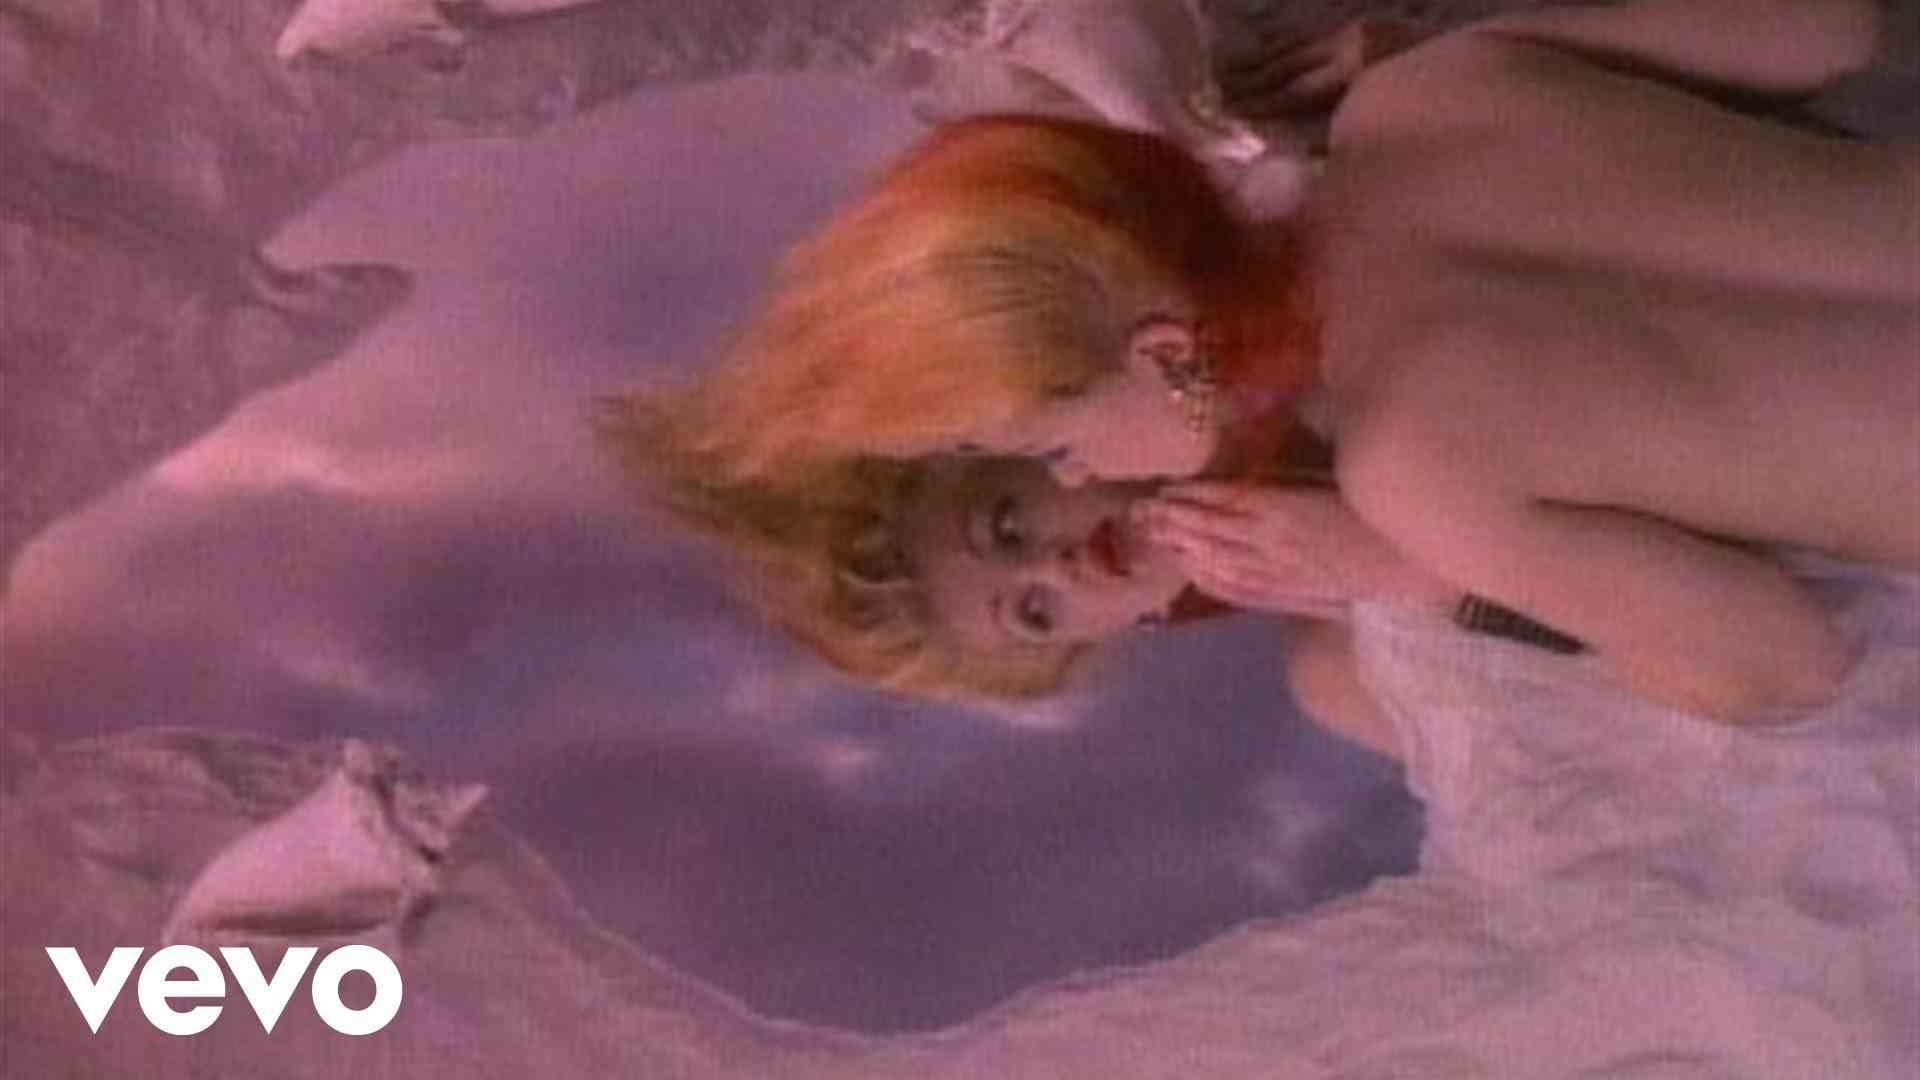 Cyndi Lauper - True Colors (Video) - YouTube